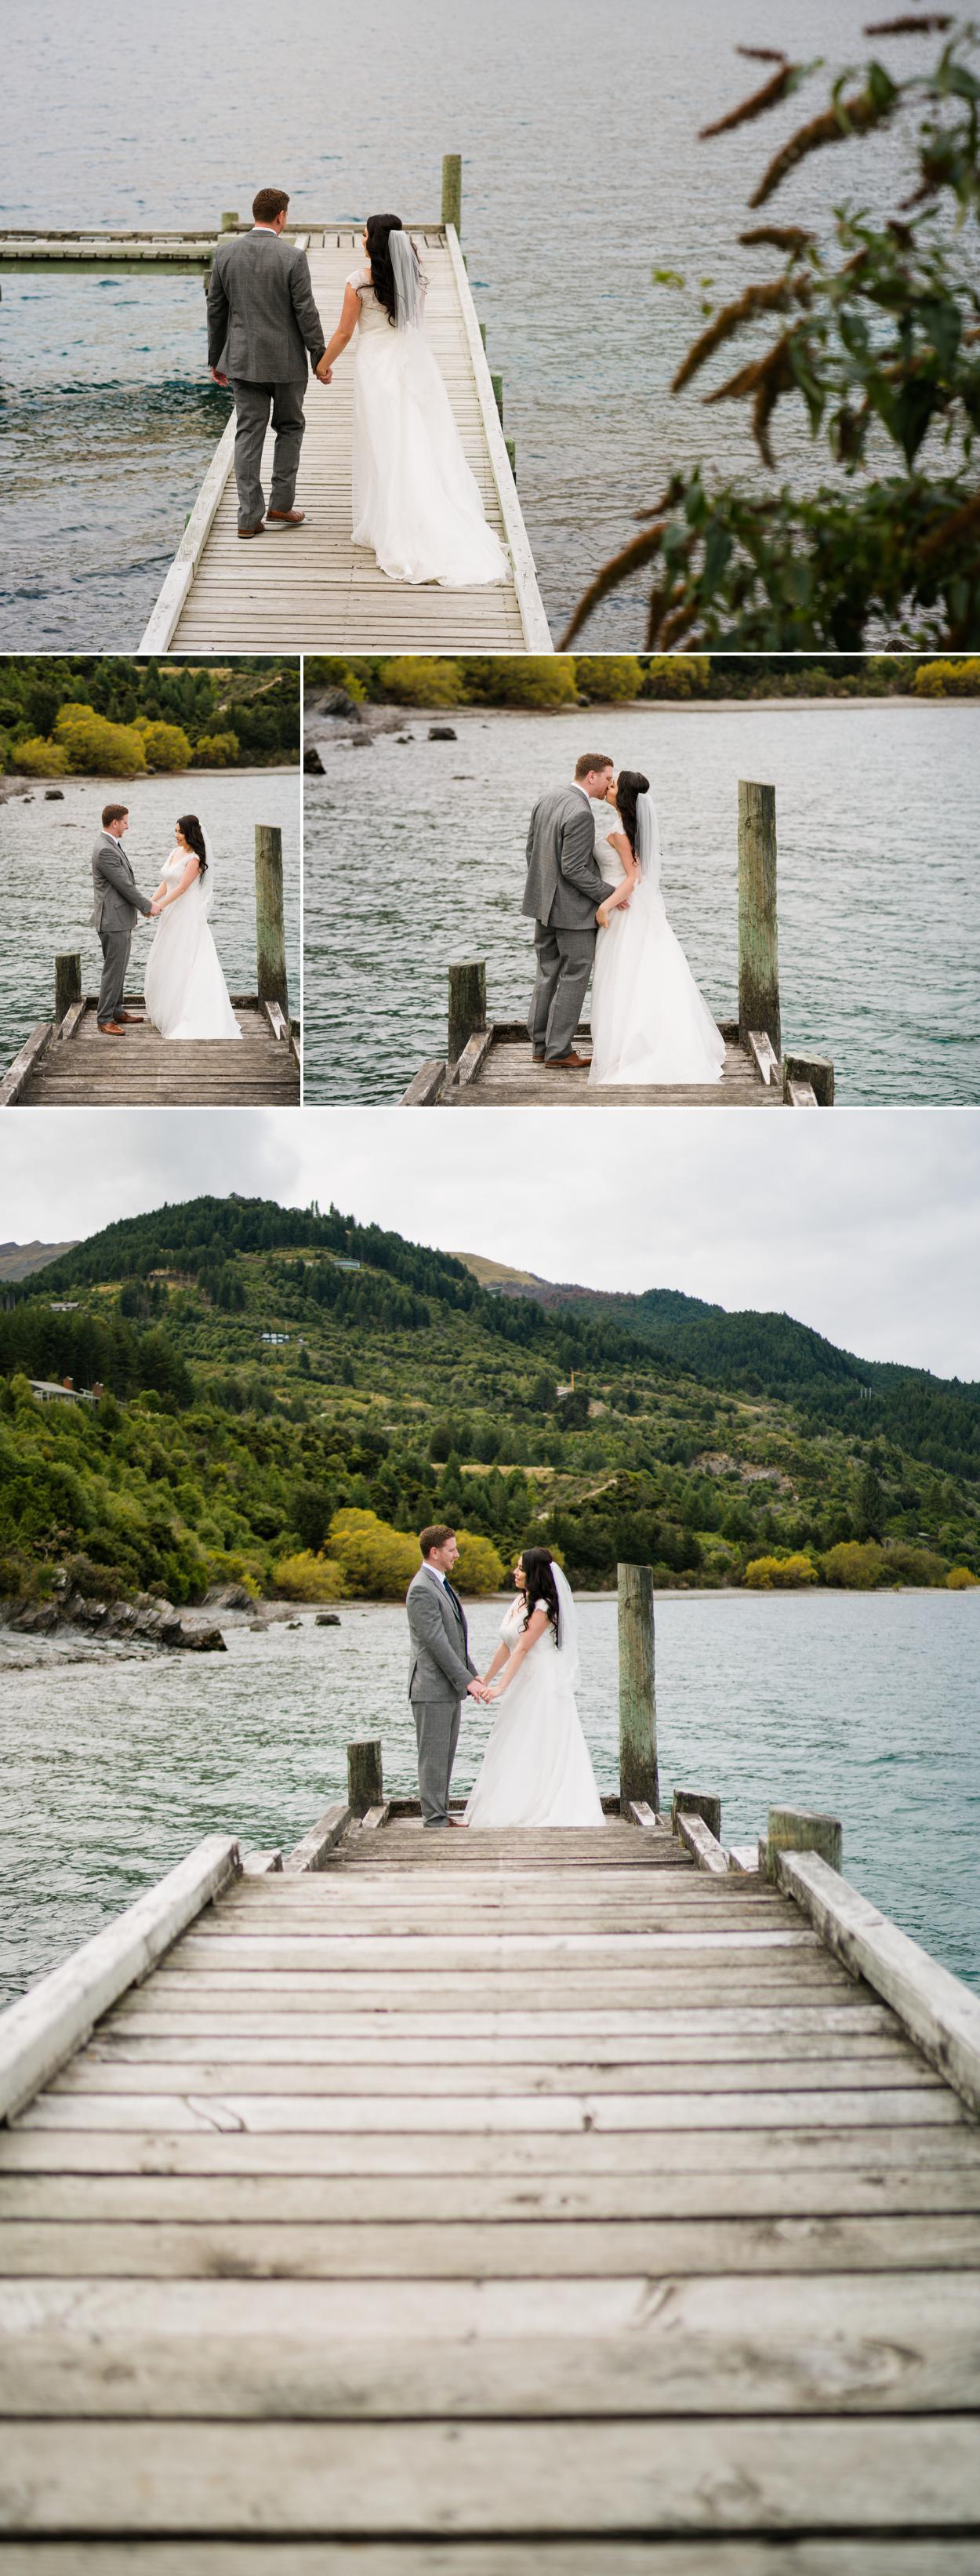 Matakauri Lodge wedding photographer Sunshine Weddings